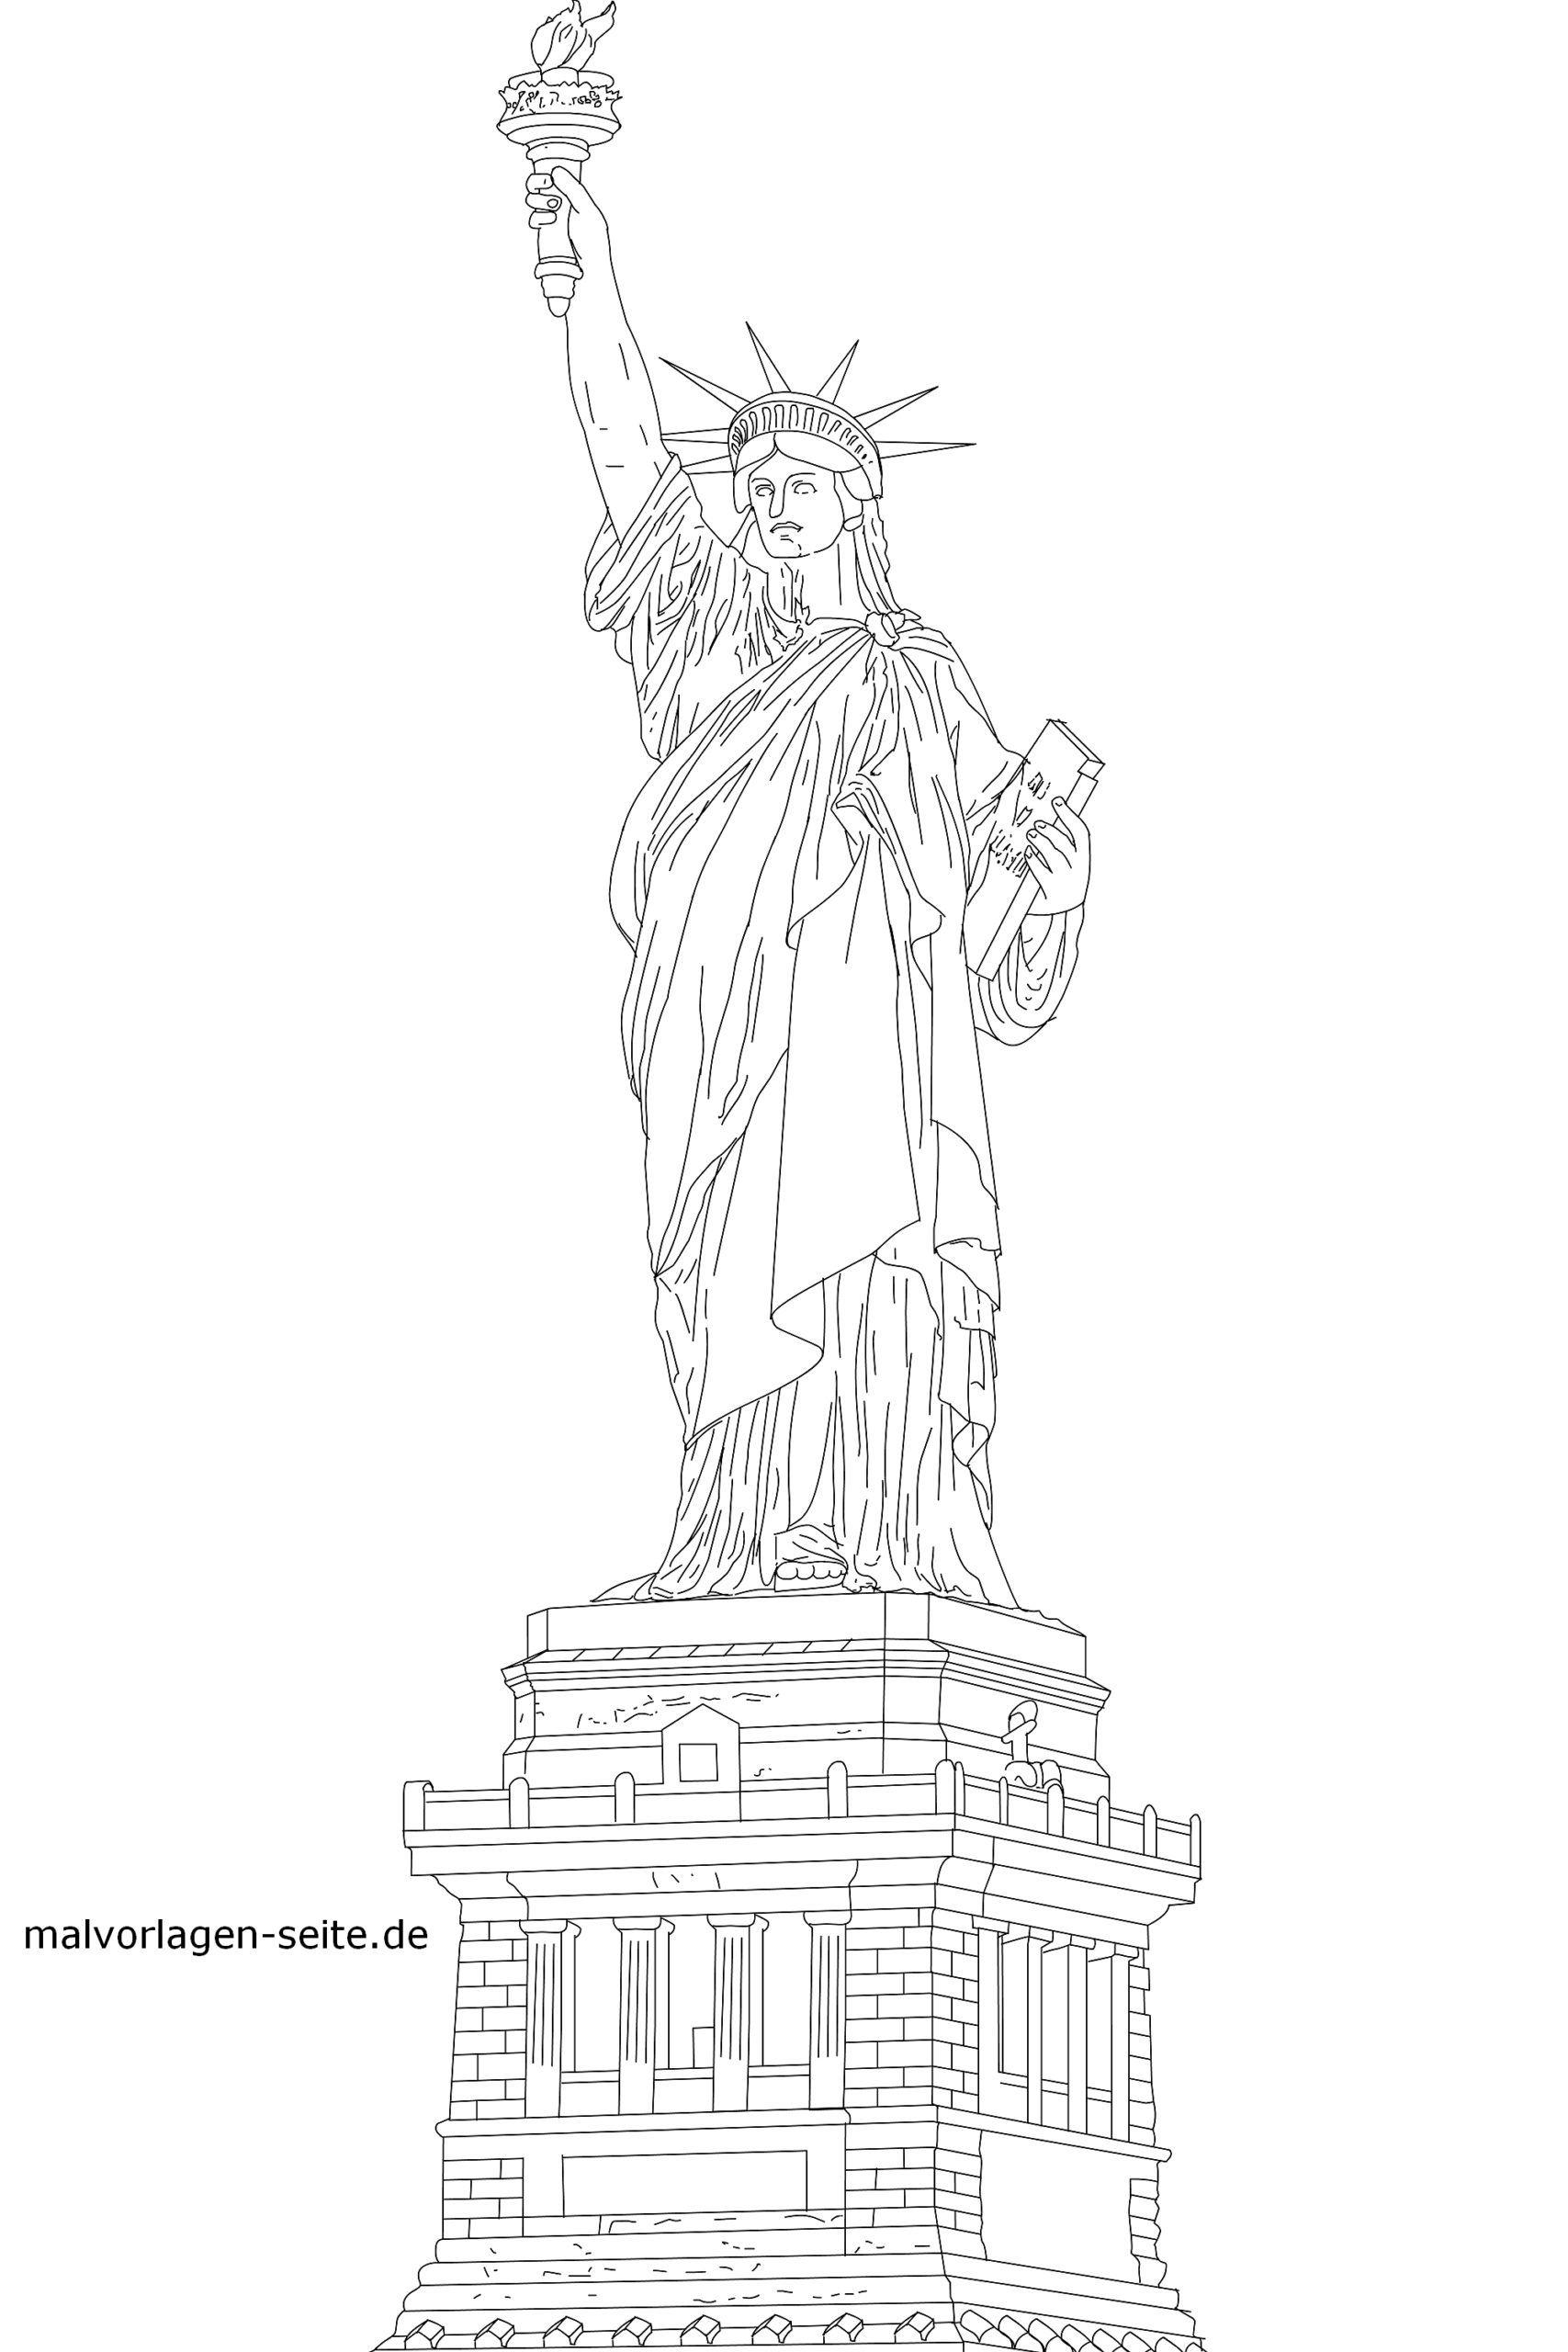 Malvorlage Statue Of Liberty Sehenswurdigkeiten Malvorlagen Mandala Malvorlagen Ausmalen